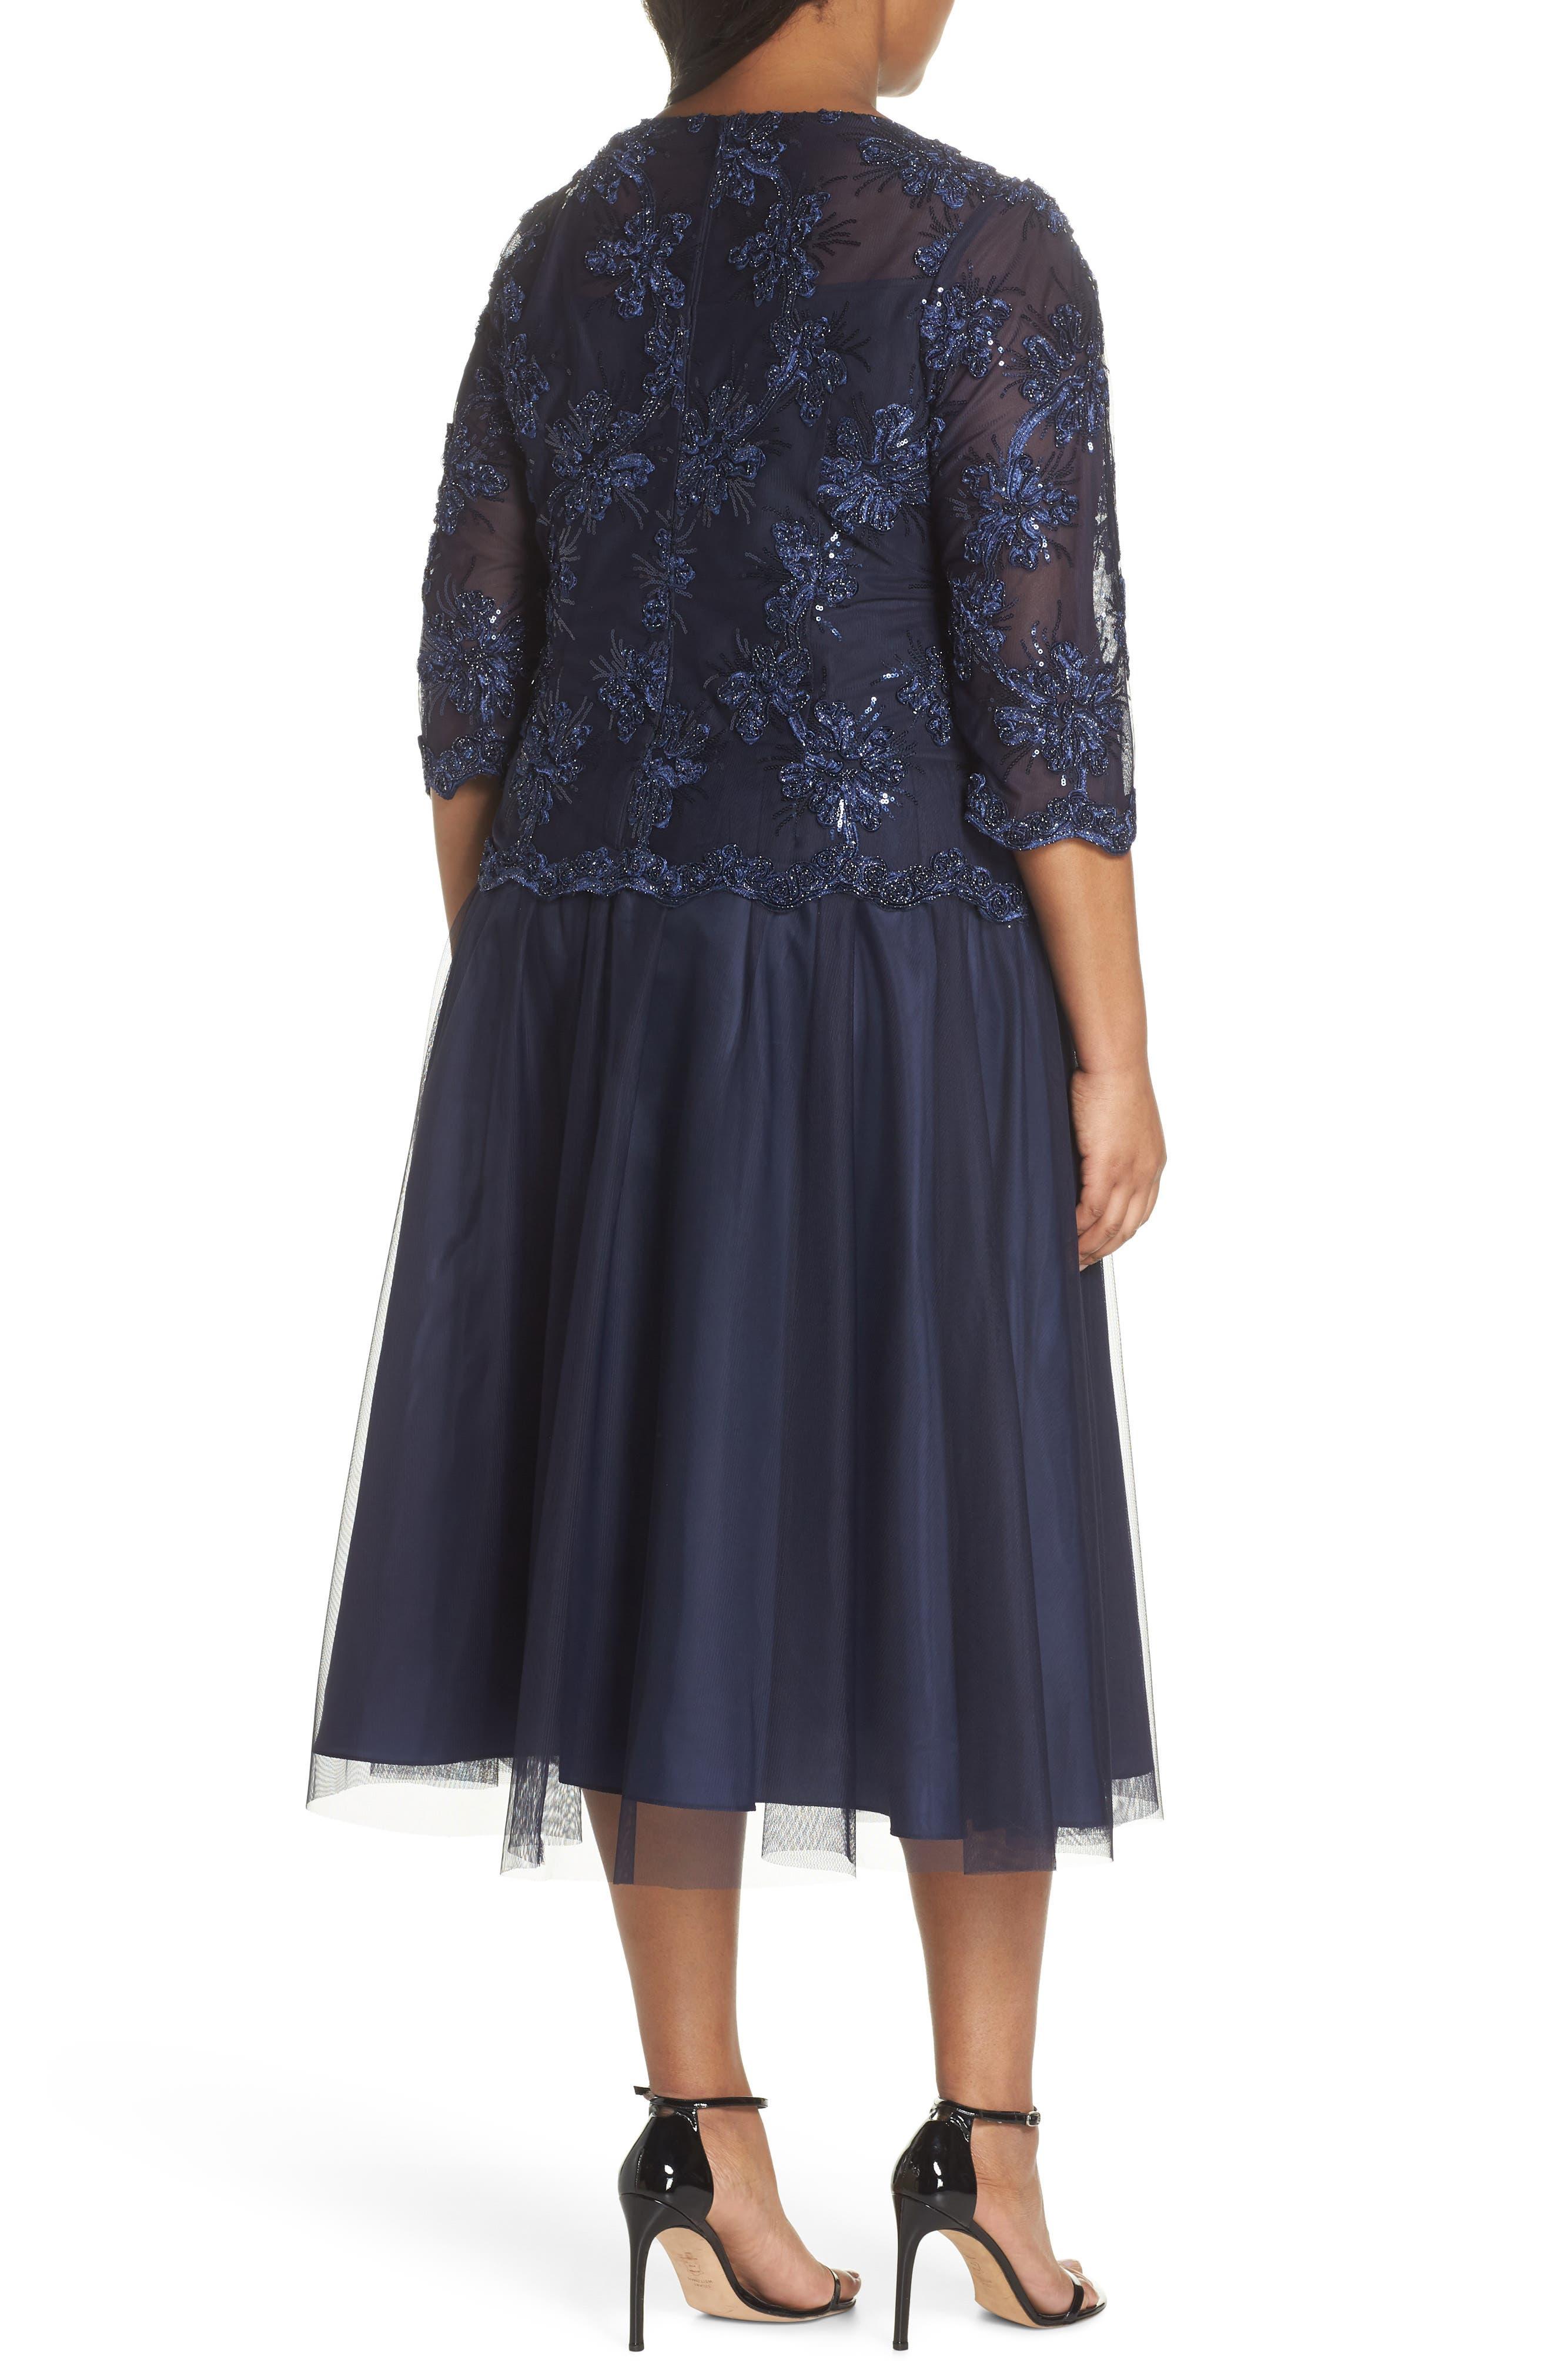 Embellished Bodice Tea Length Mesh Dress,                             Alternate thumbnail 2, color,                             Navy